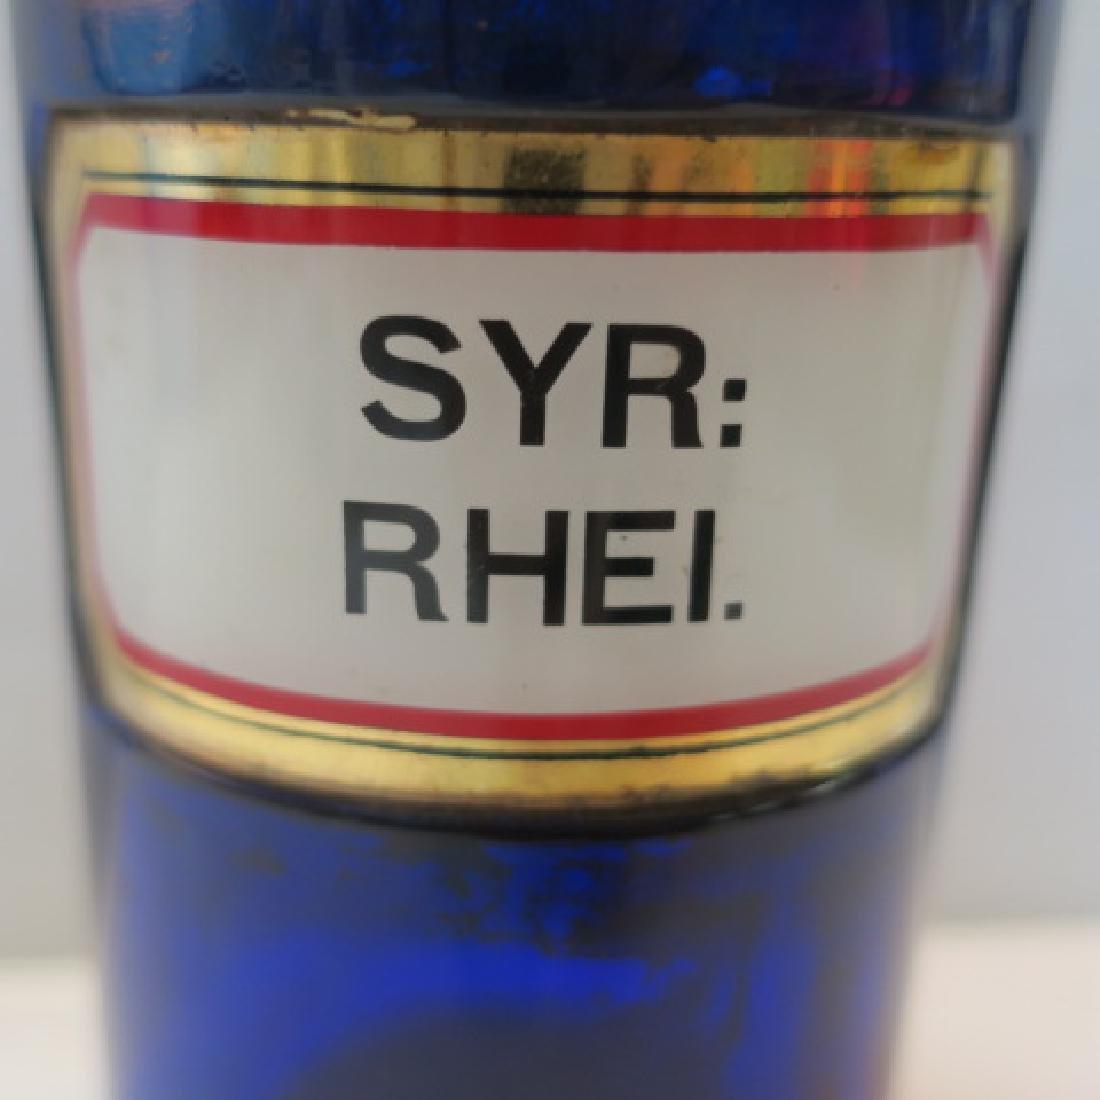 "Cobalt Antique Apothecary Bottle ""SYR:RHEI."": - 2"